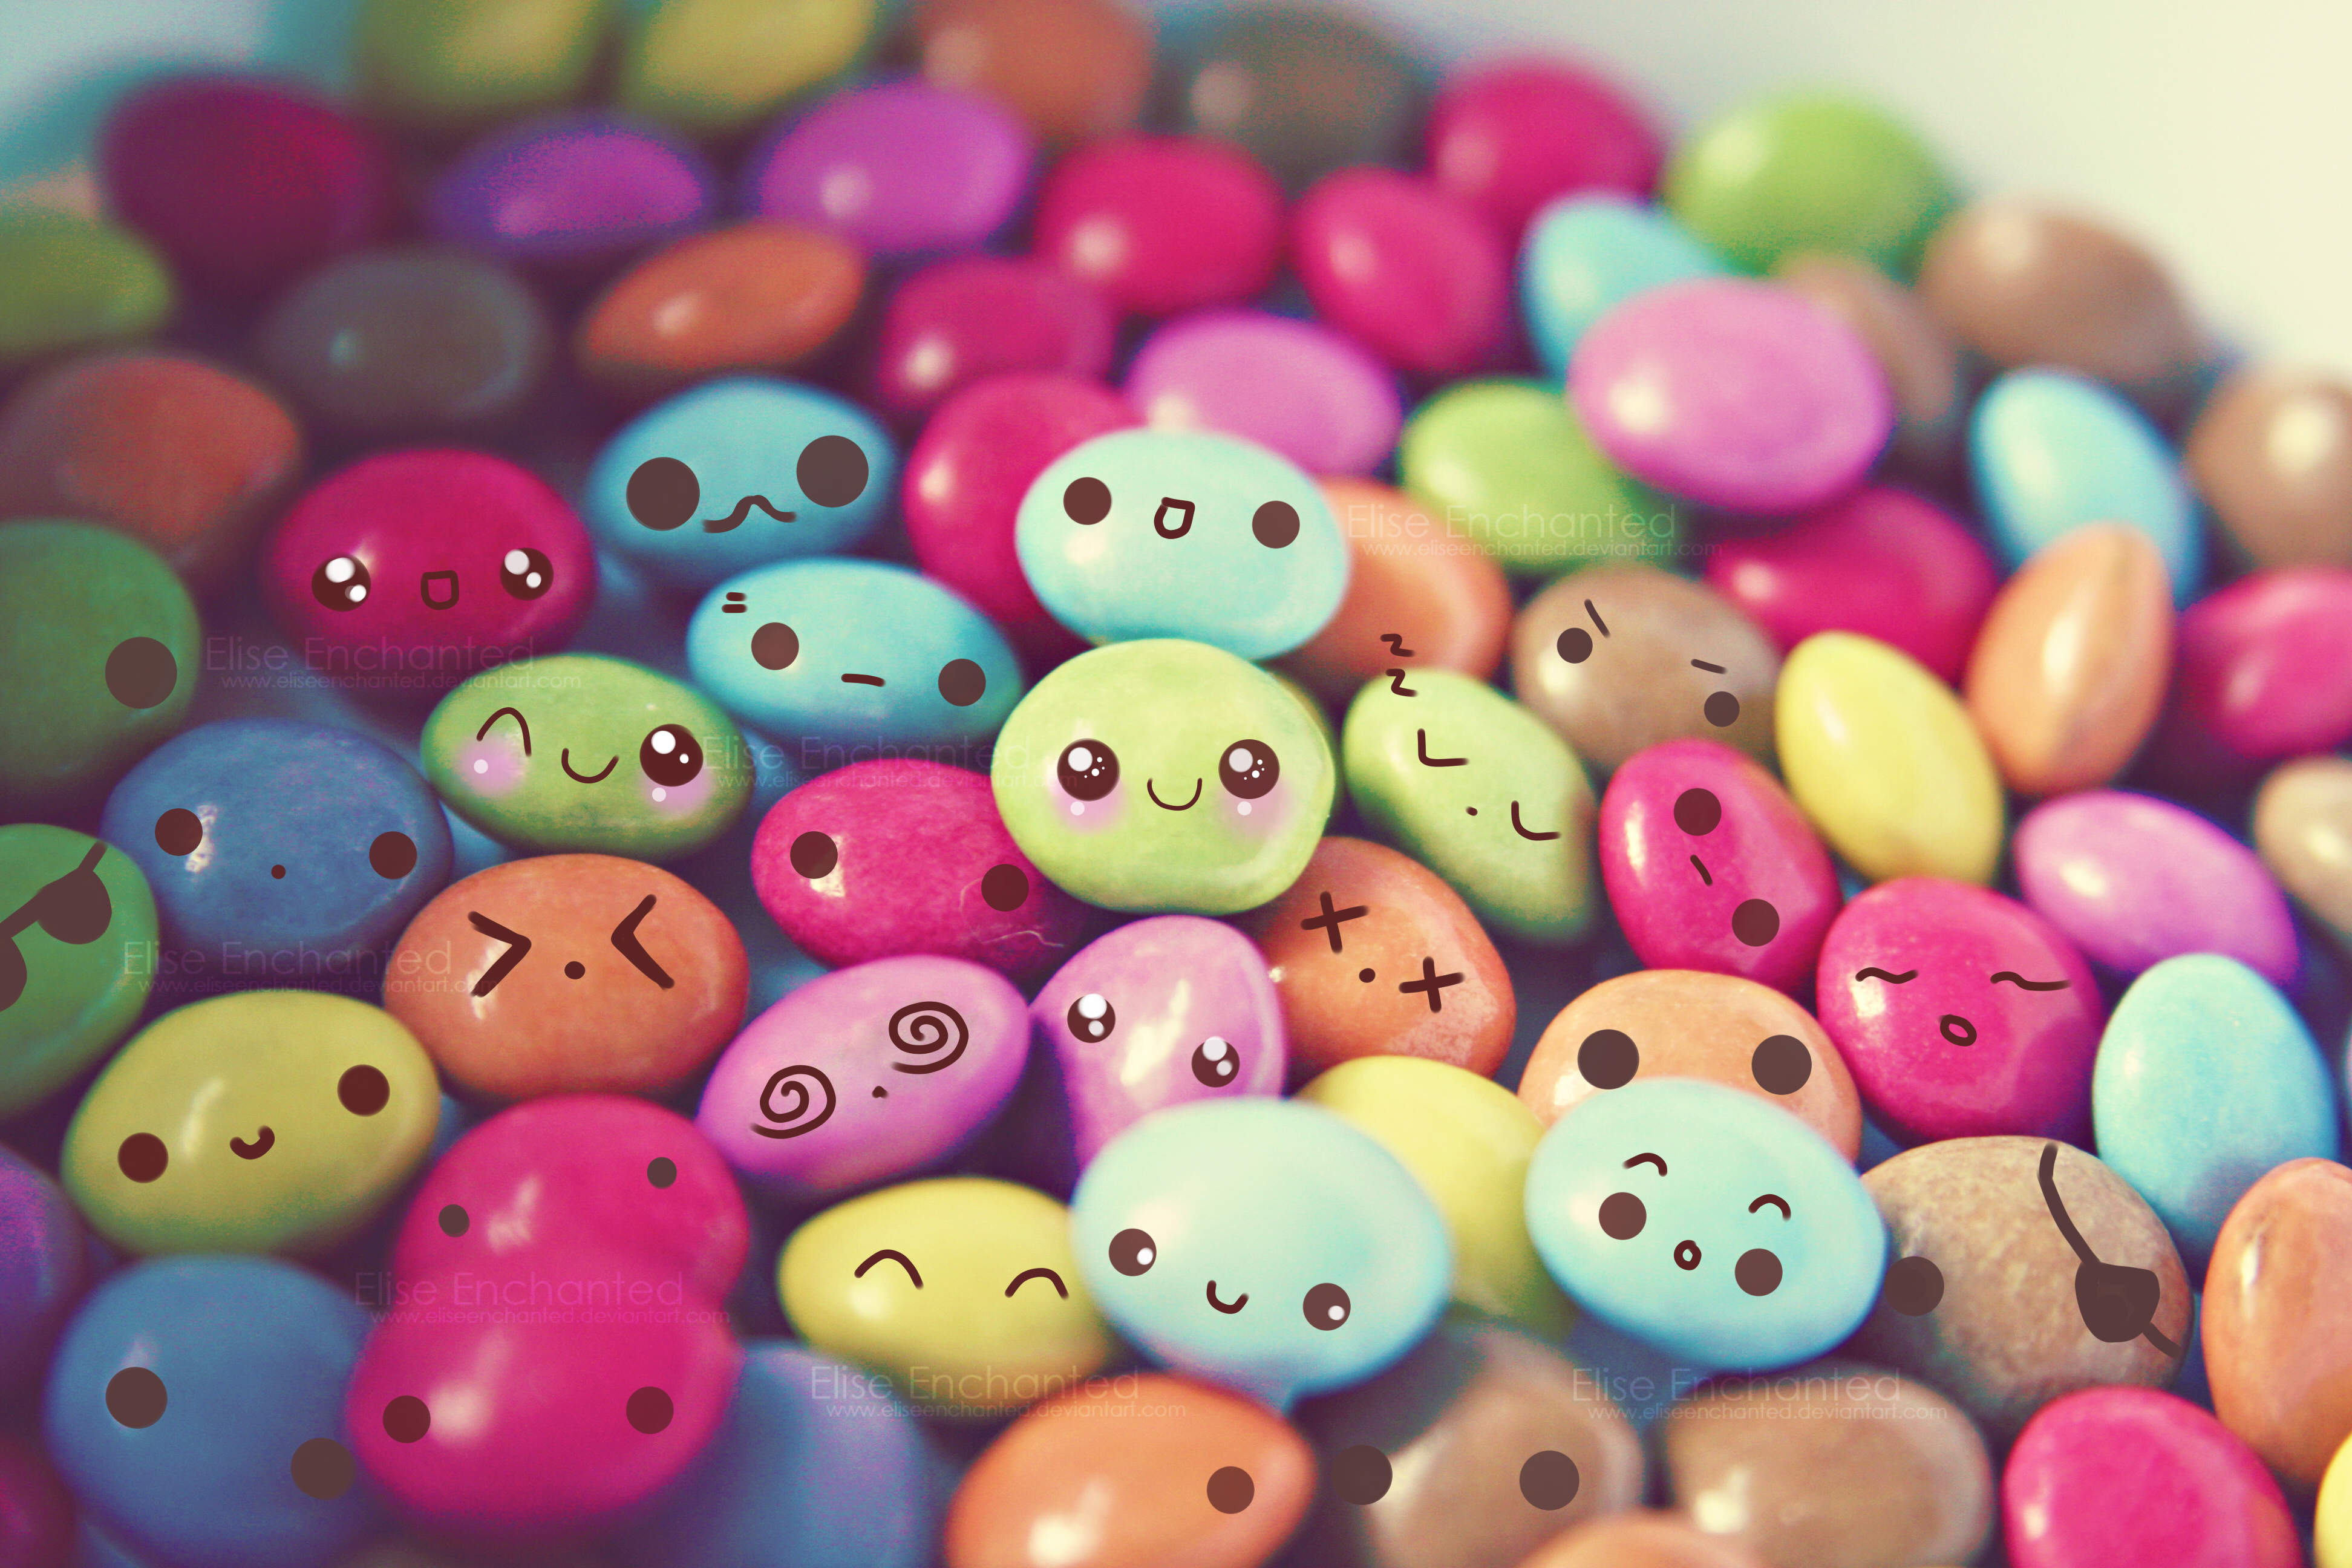 cute candy wallpapers 13 desktop background hivewallpaper com